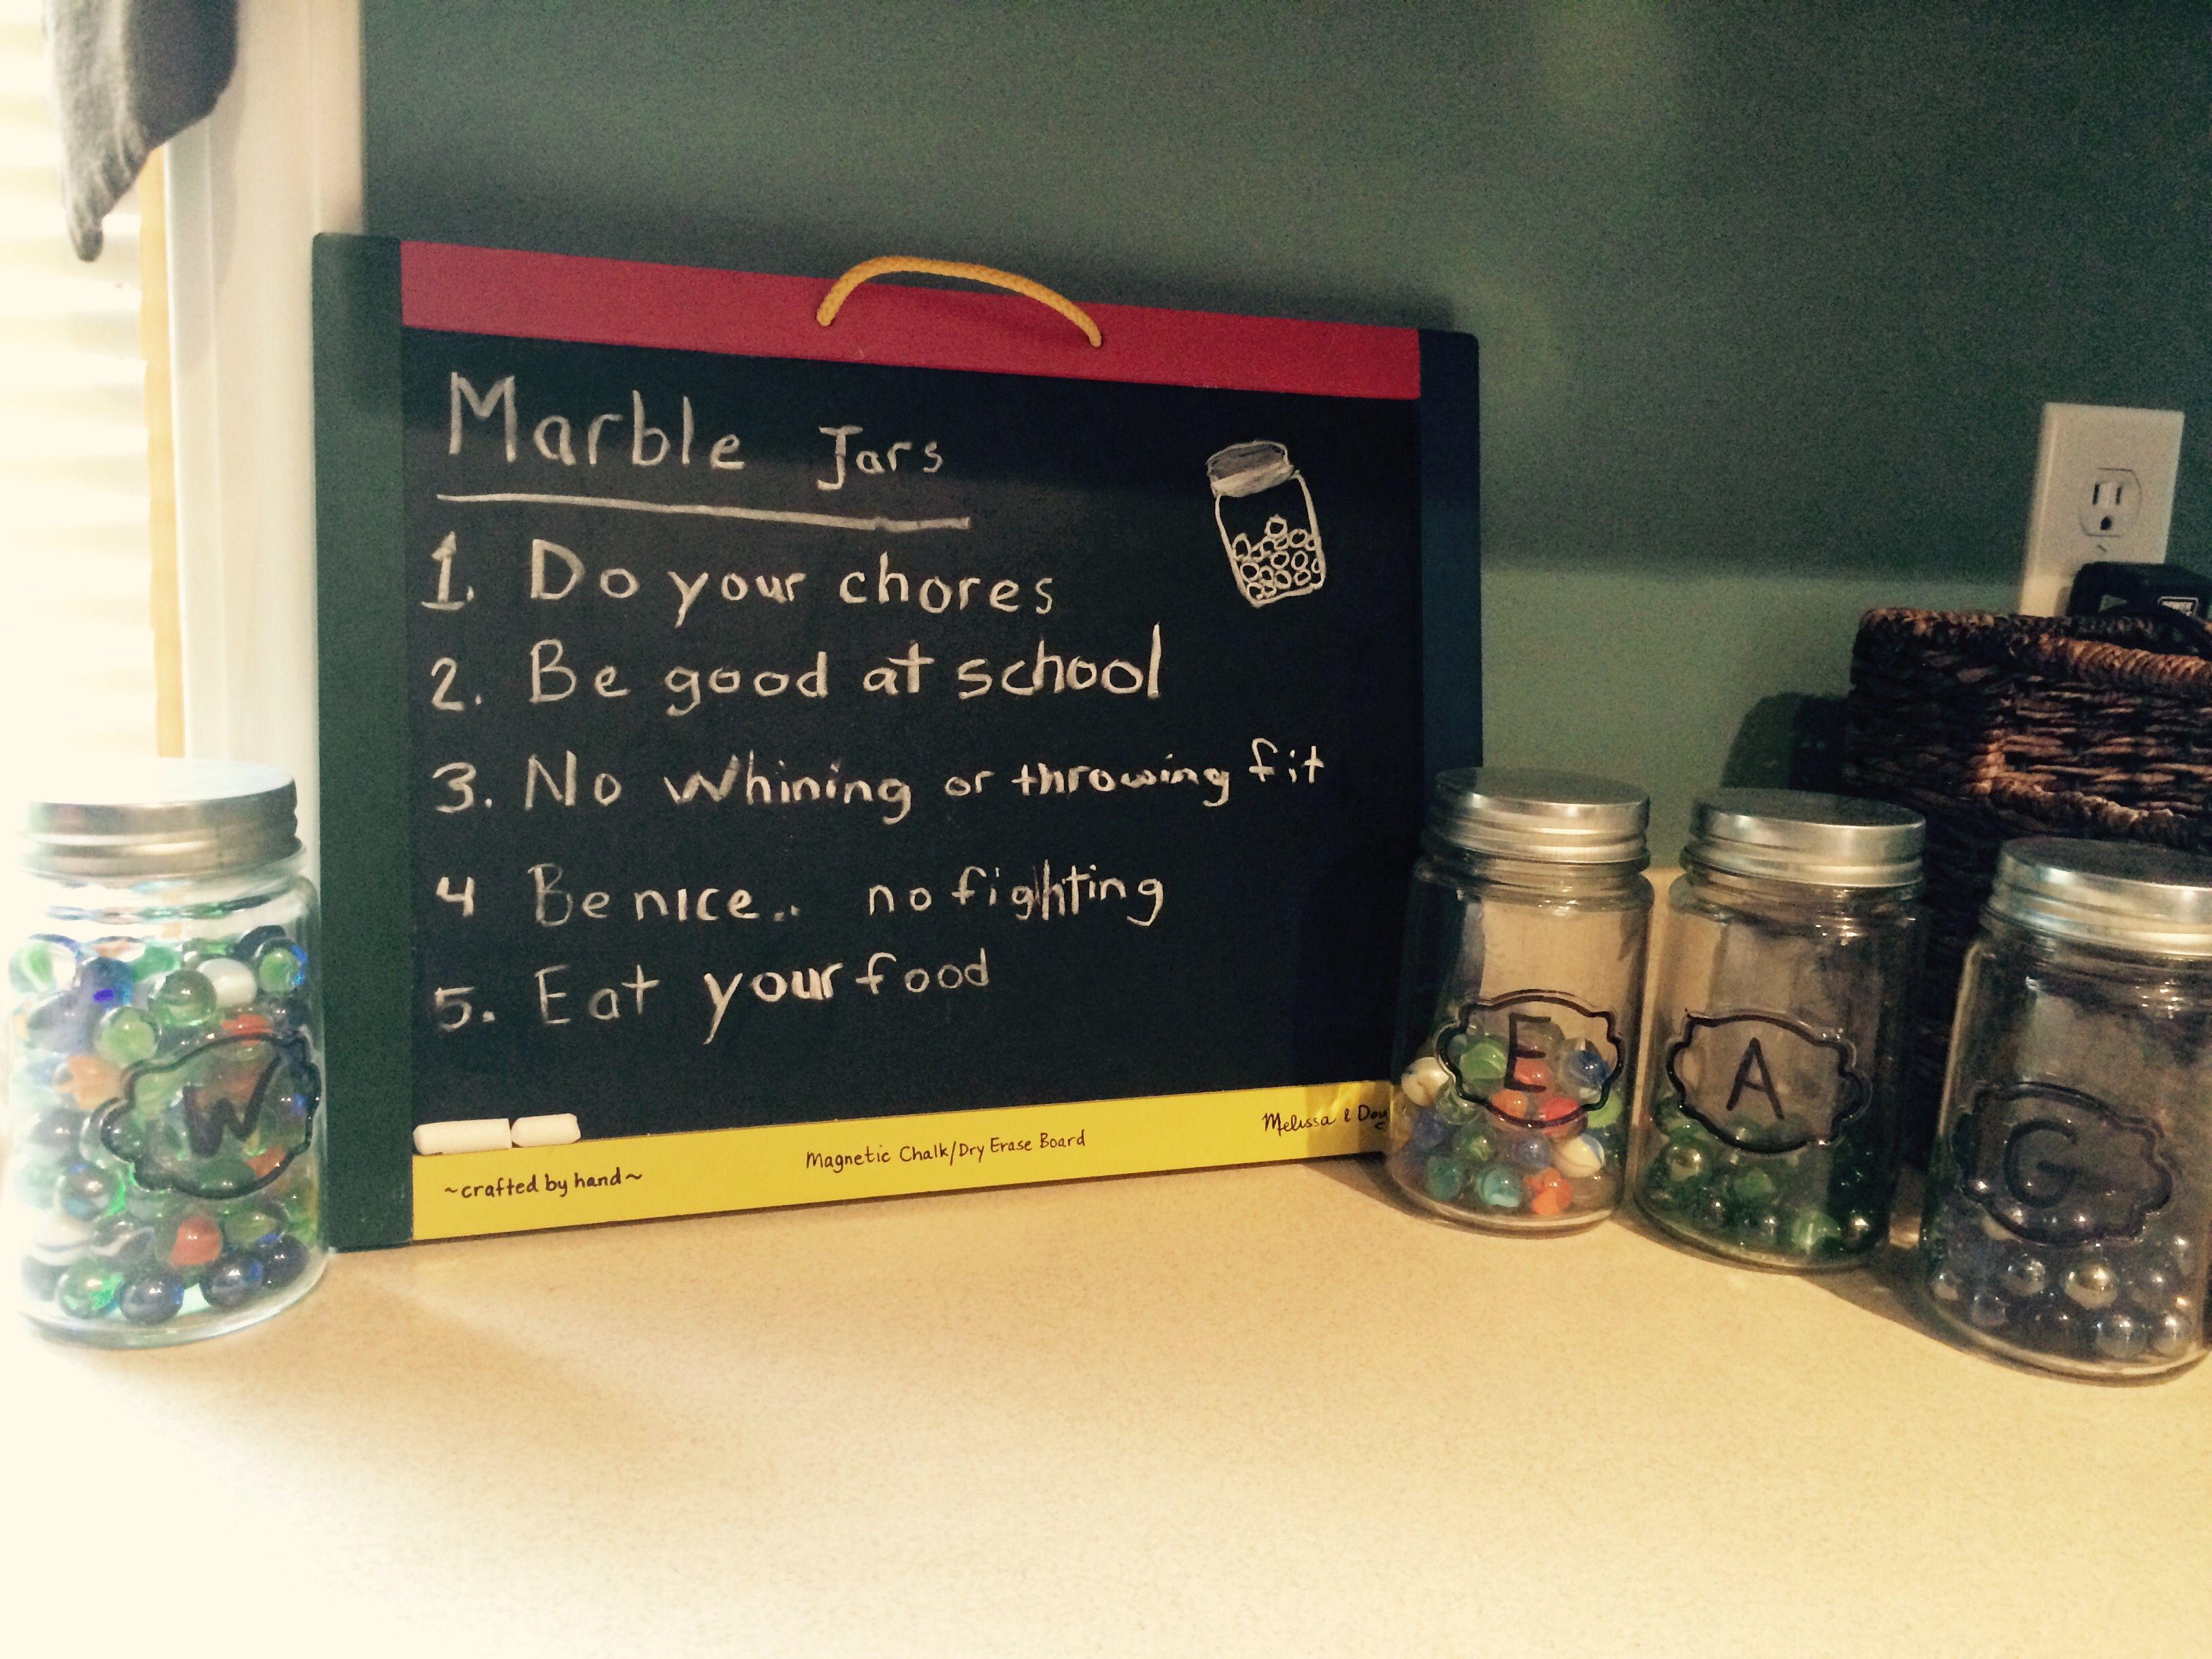 Marble Jar Behavior Reward System Marble Jar Reward System For Kids Kids Behavior